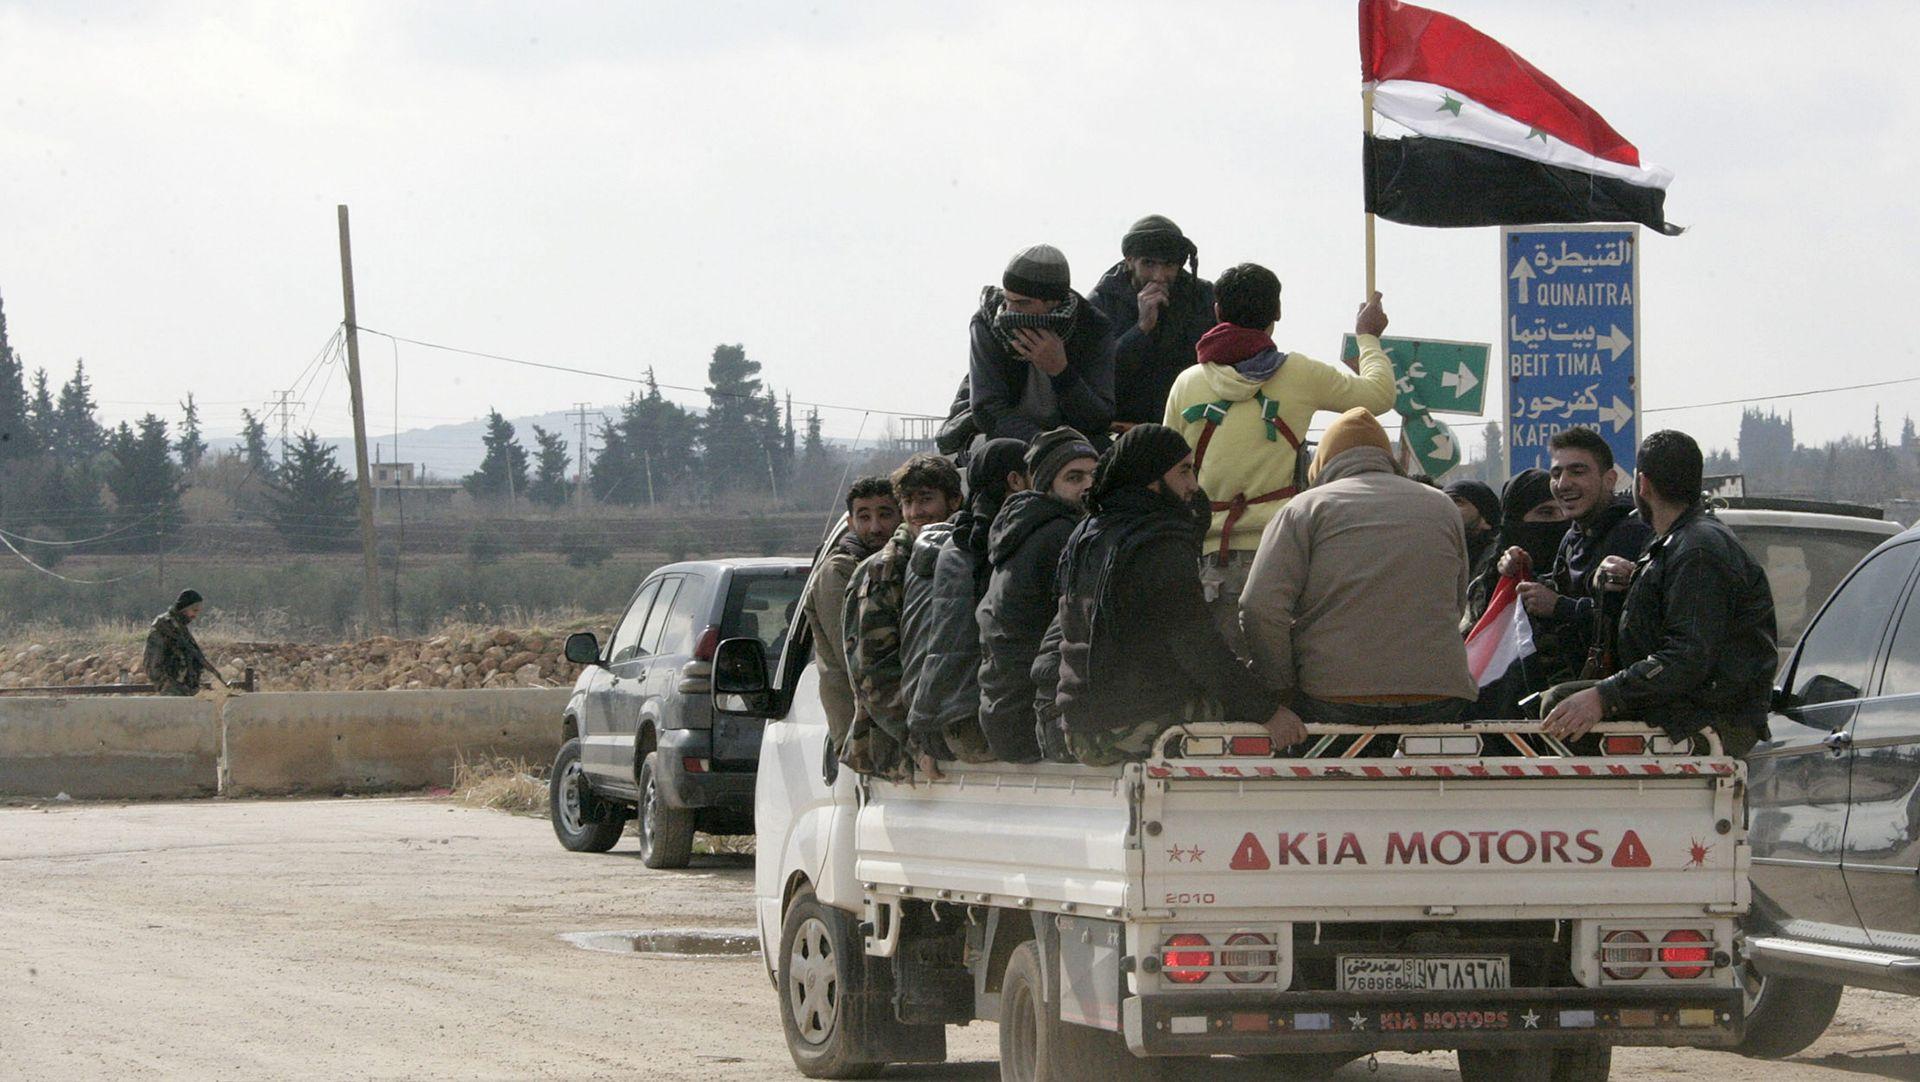 Sirijac na austrijskom sudu zbog ubojstva 20 pripadnika Asadove vojske